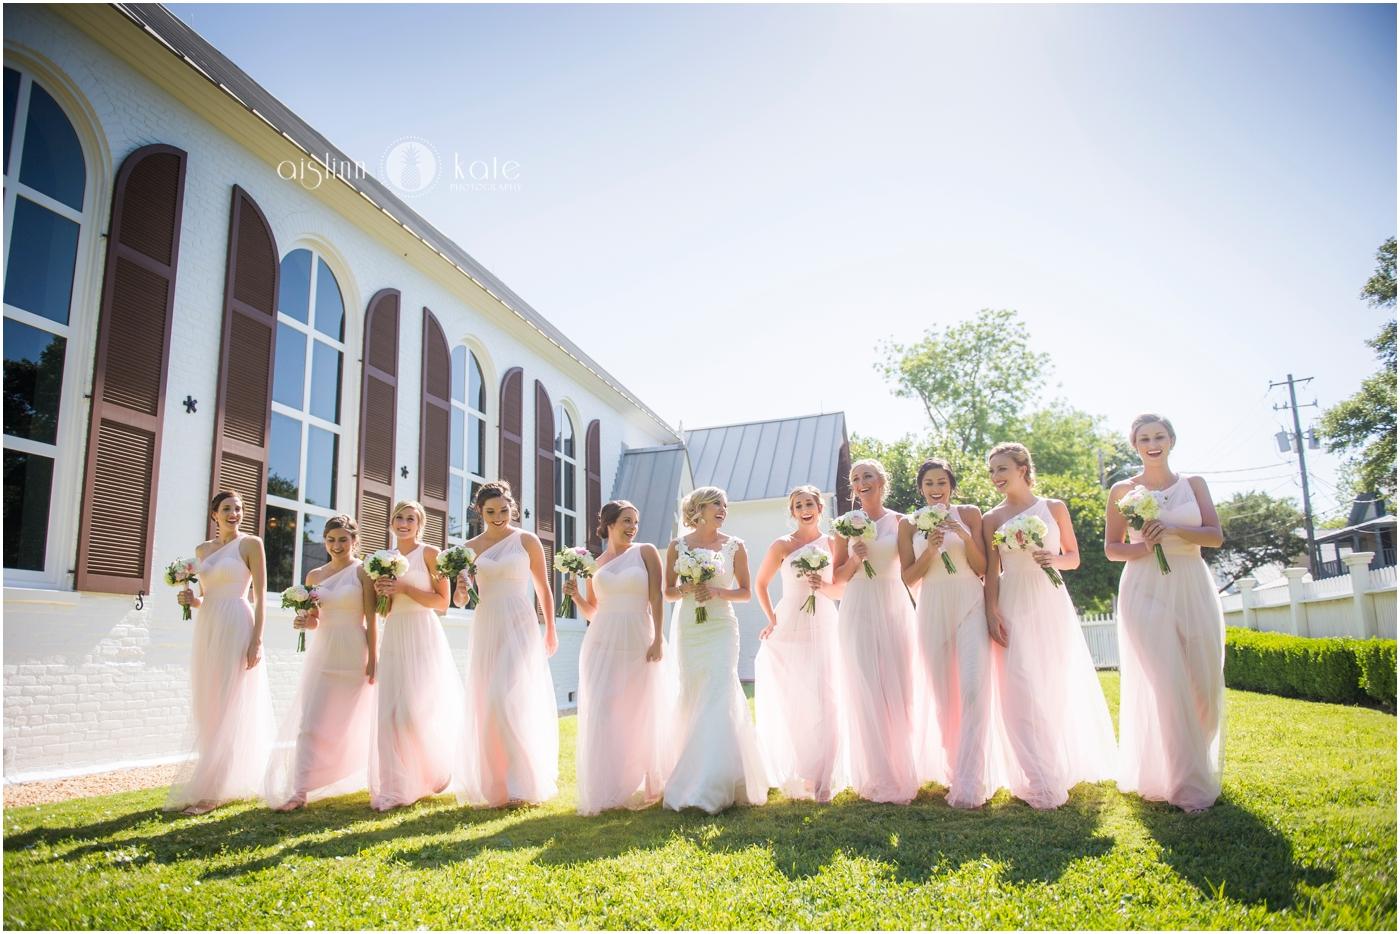 Pensacola-Destin-Wedding-Photographer_6174.jpg